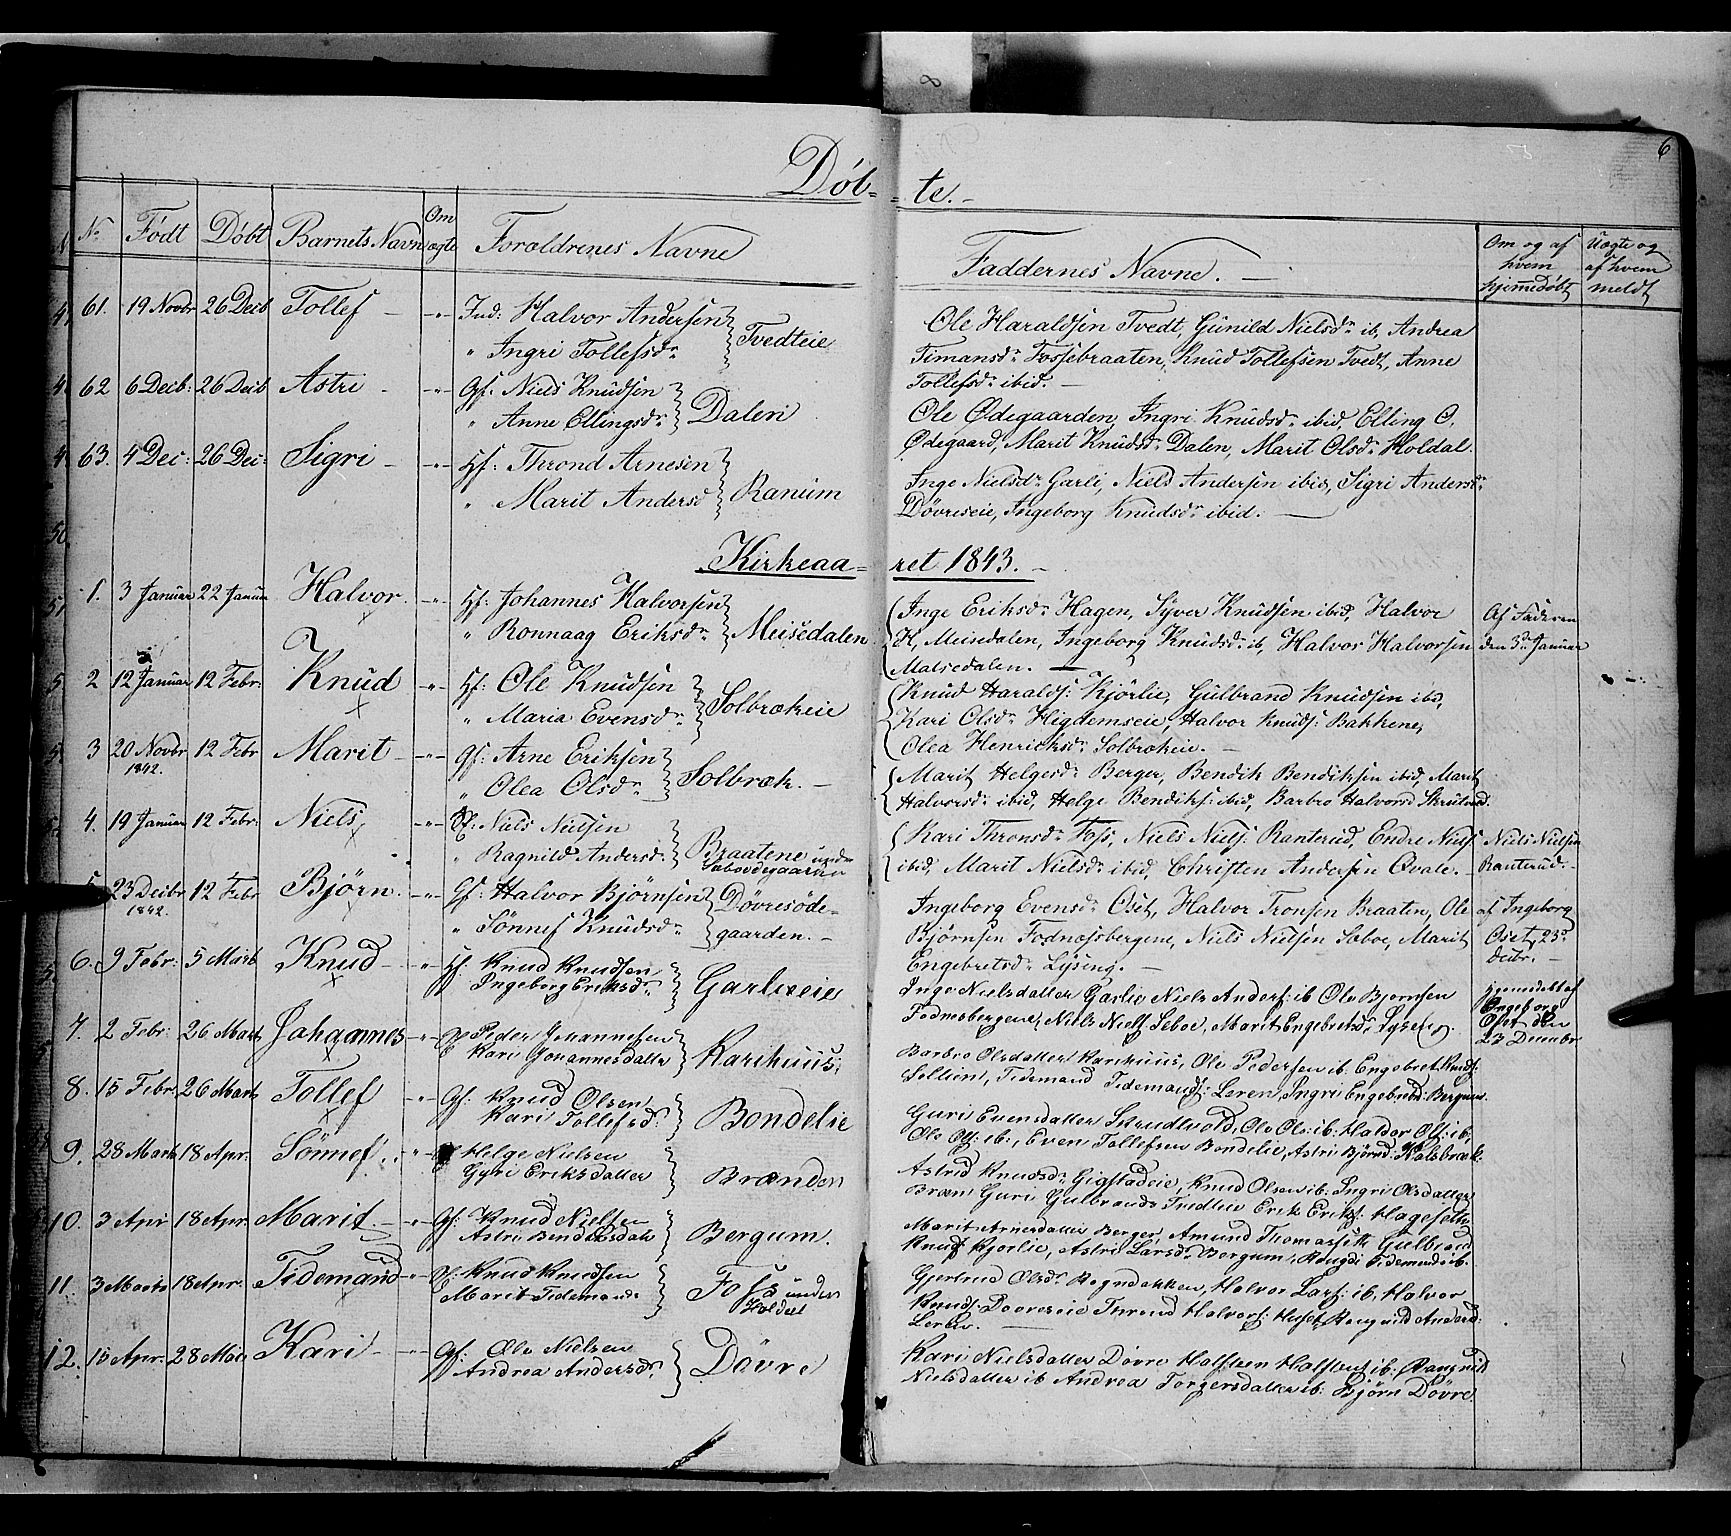 SAH, Nord-Aurdal prestekontor, Ministerialbok nr. 7, 1842-1863, s. 6